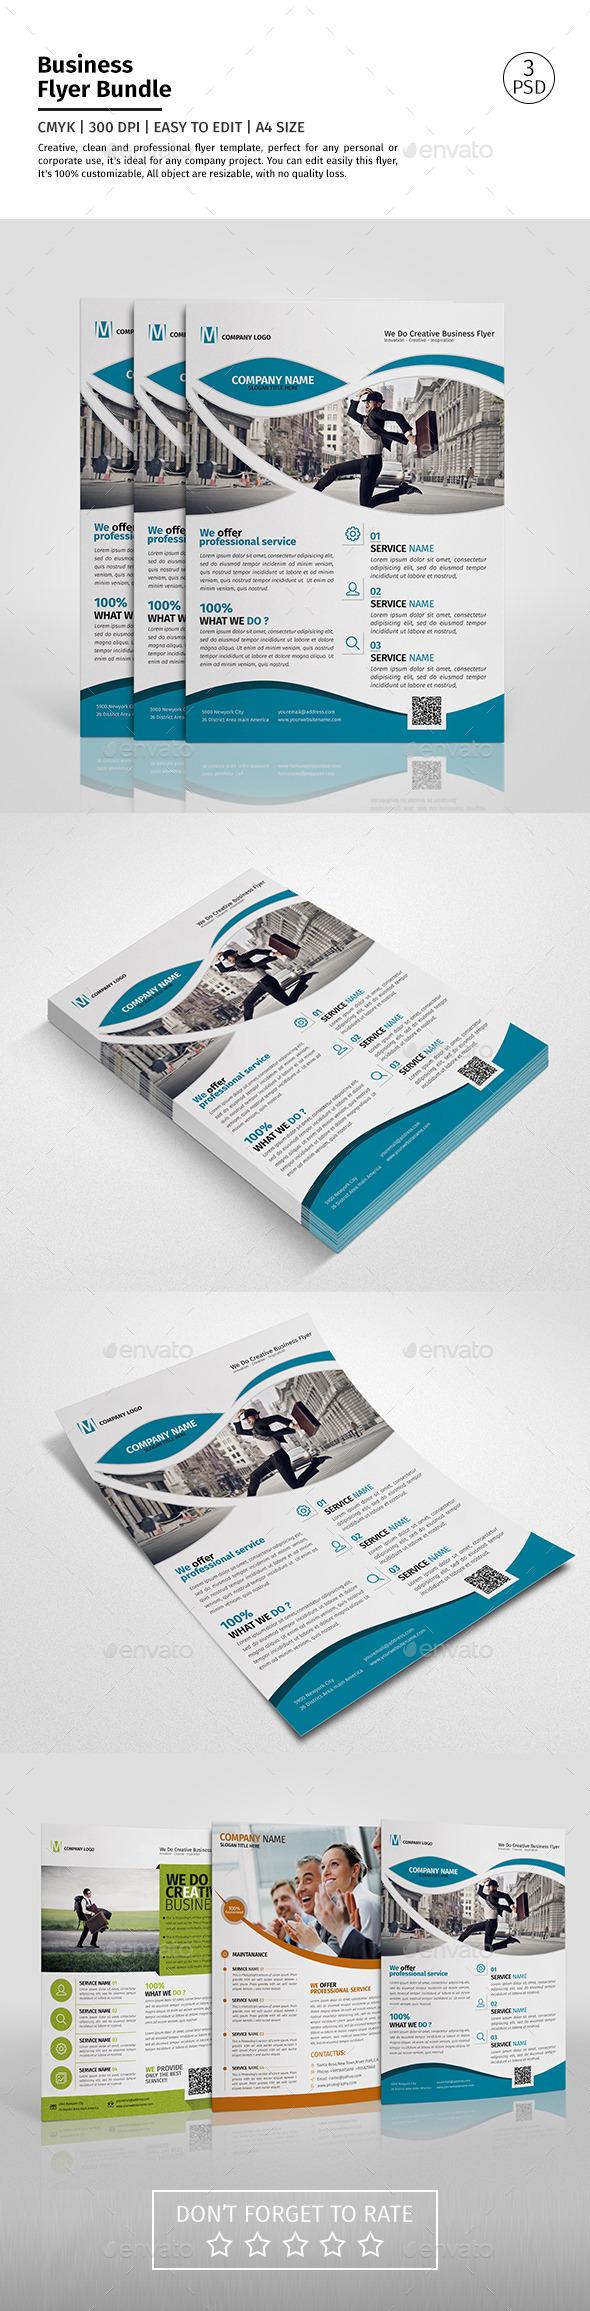 Corporate Flyer Bundle 01 - Corporate Flyers